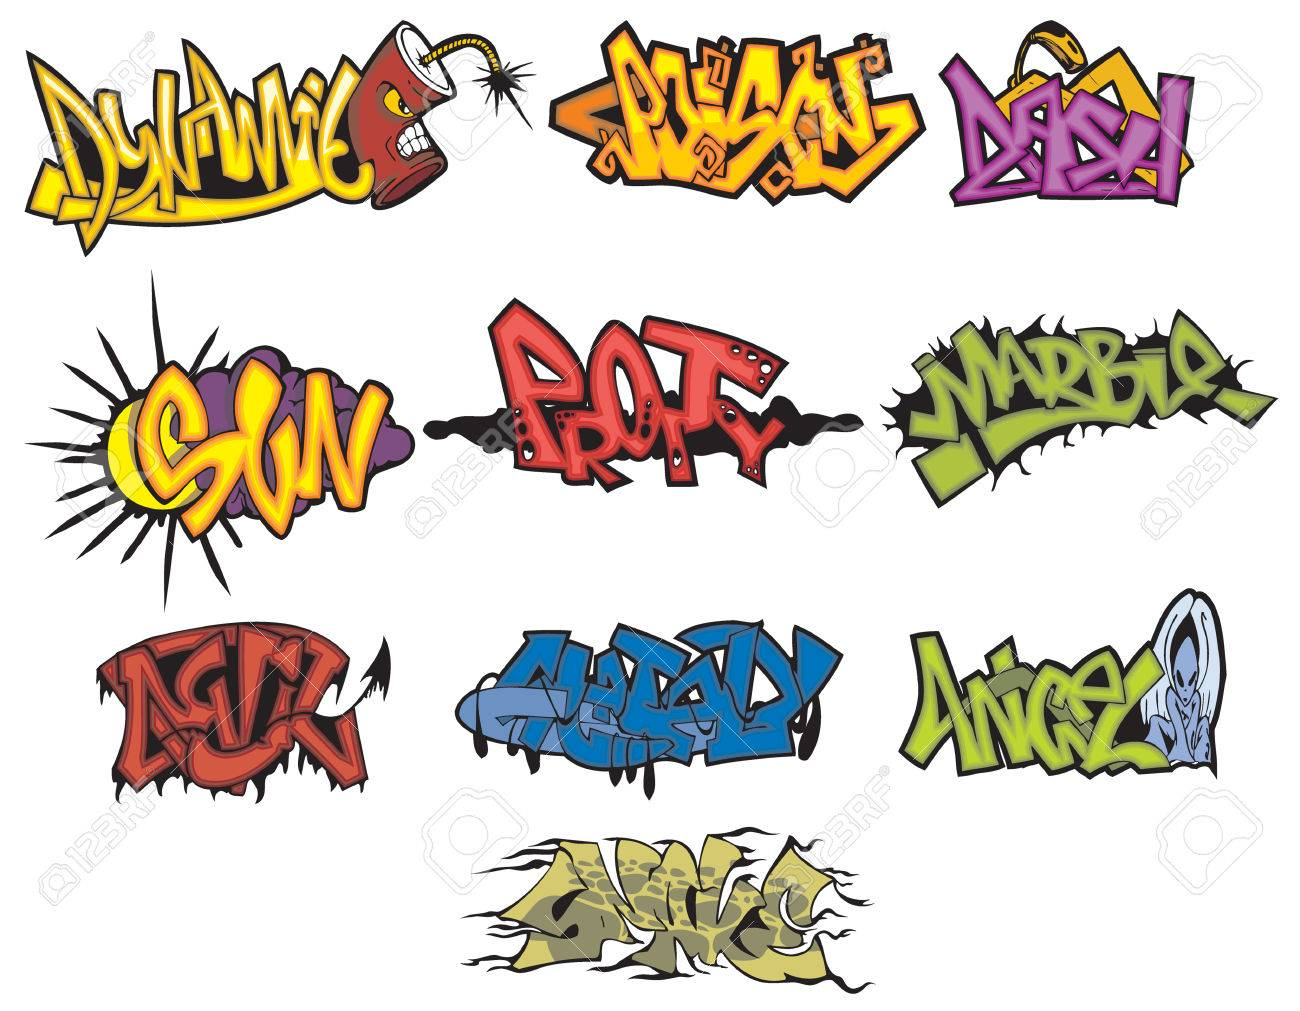 Create A Wild Graffiti Style Arrow Design Graffiti Arrows Designs Vector Illustration